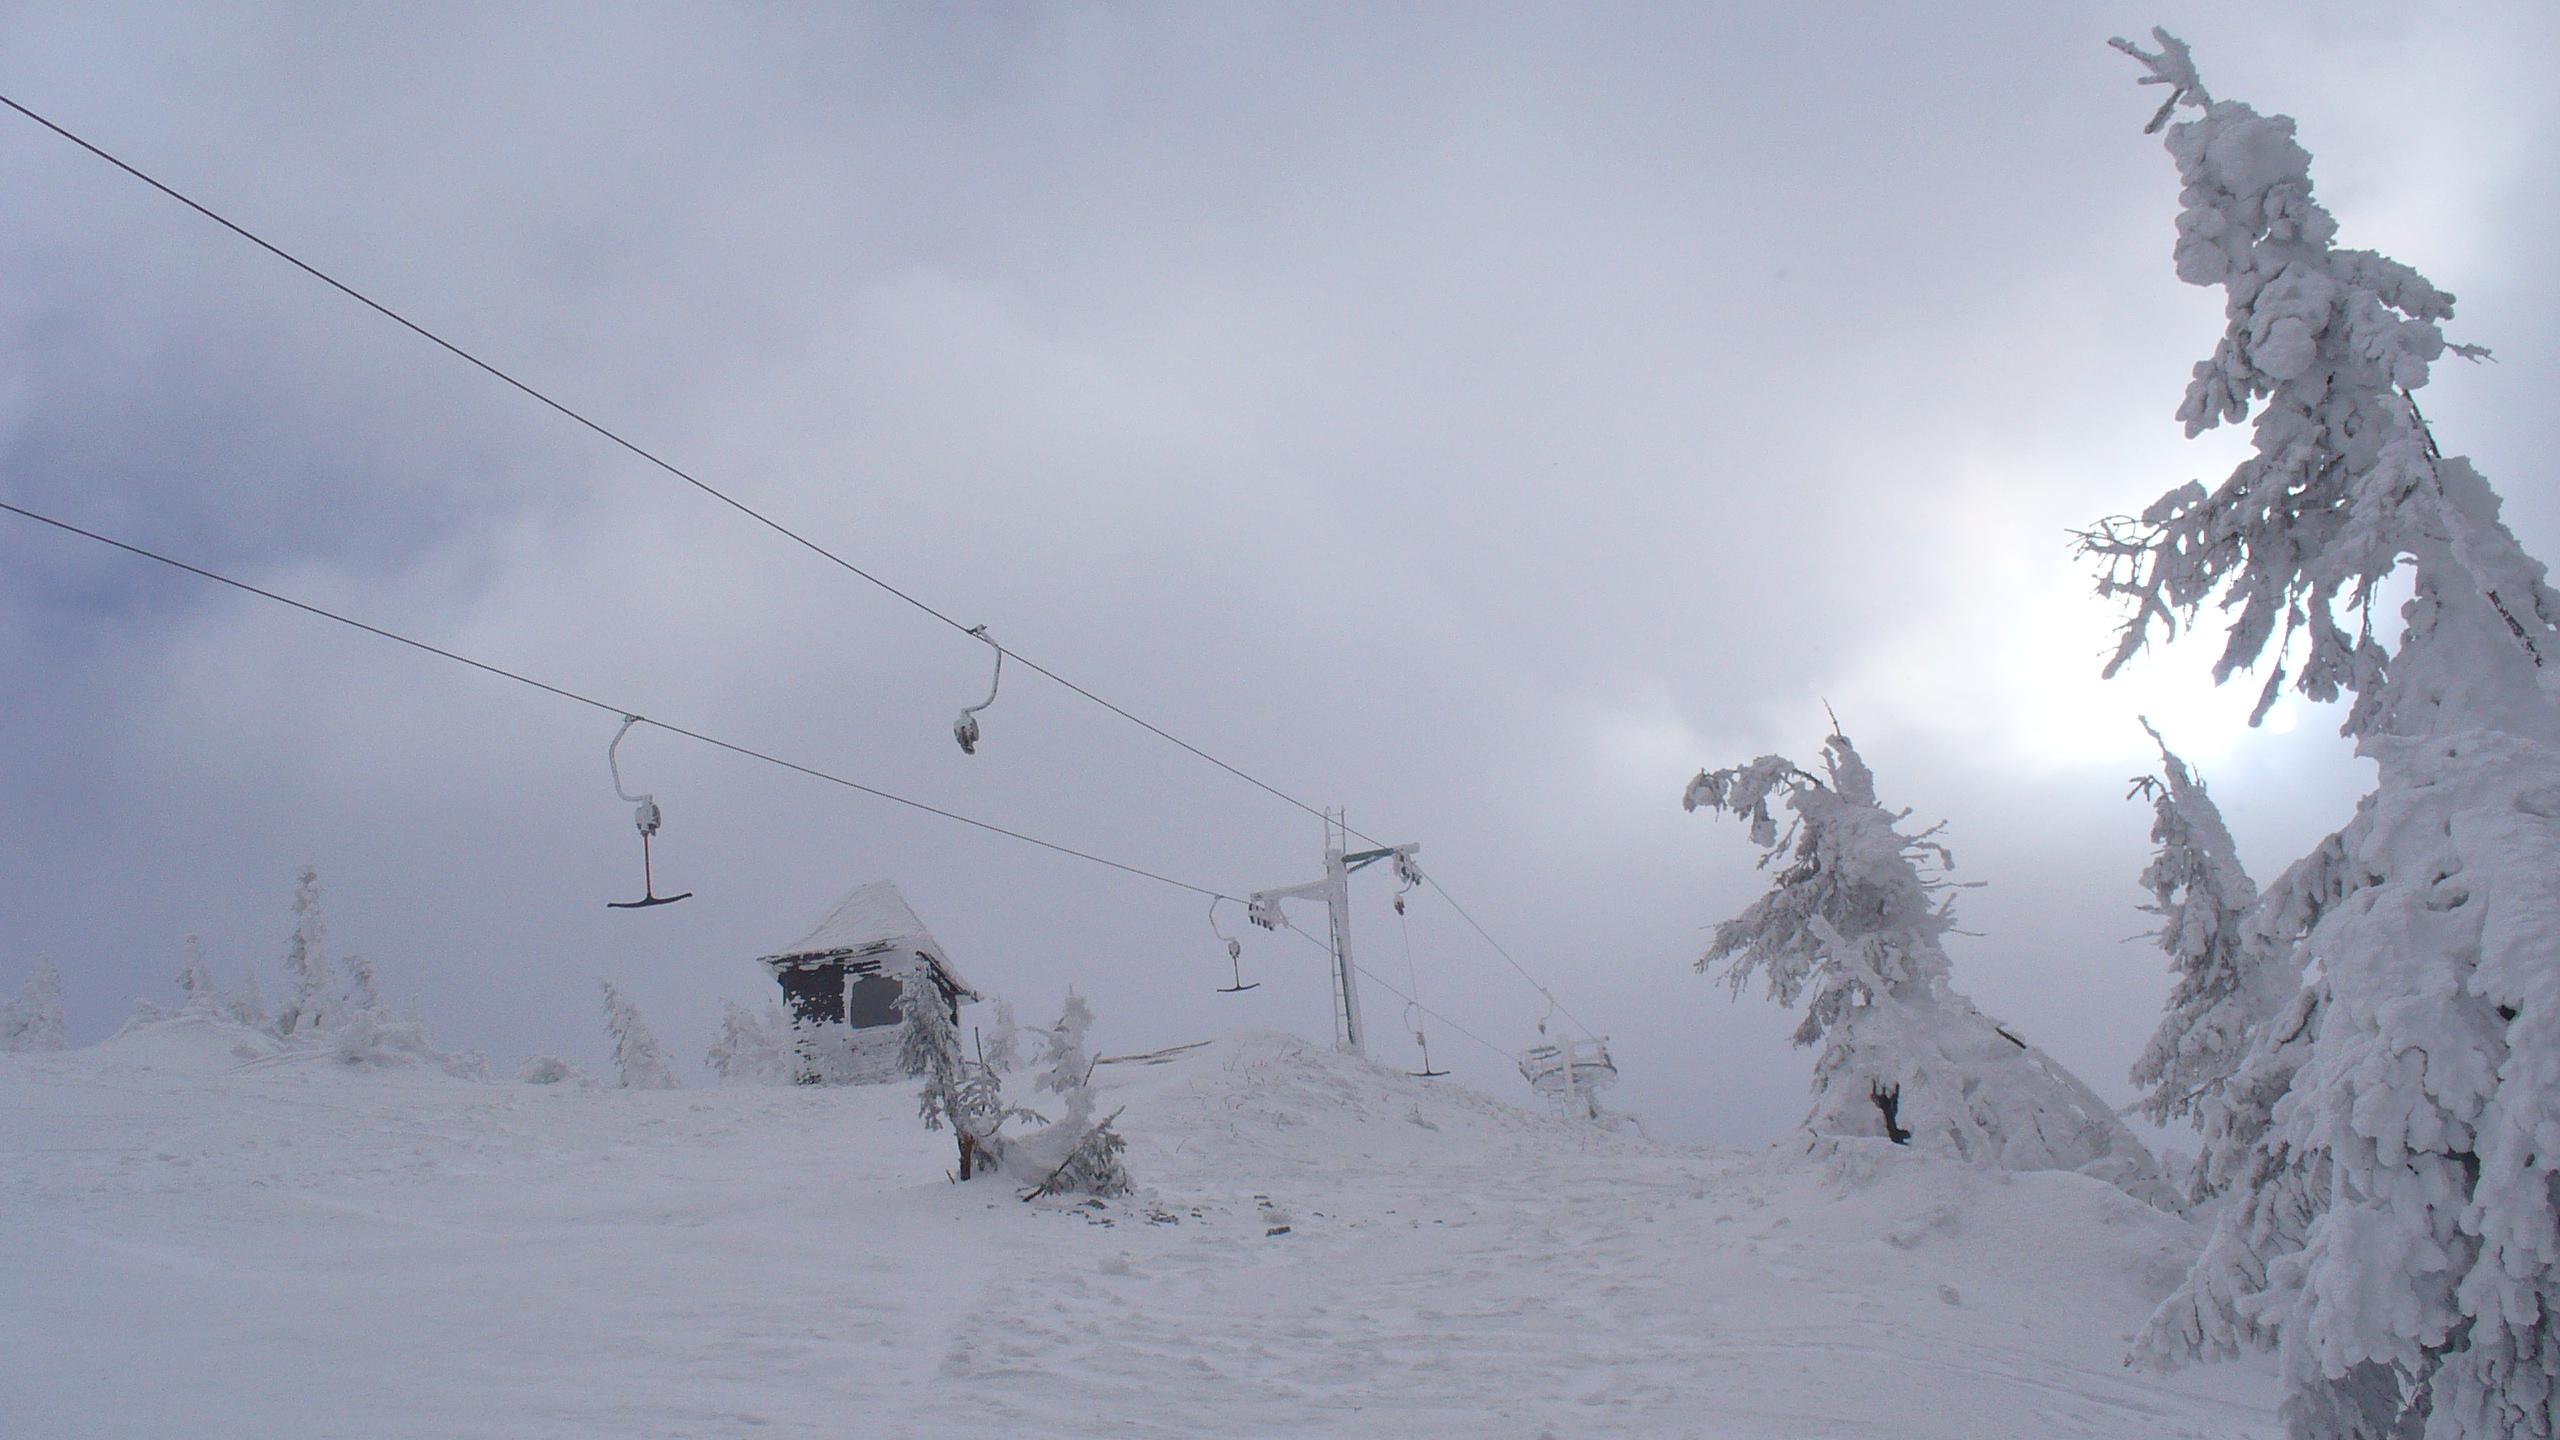 ski lift skiing snowboarding - photo #27